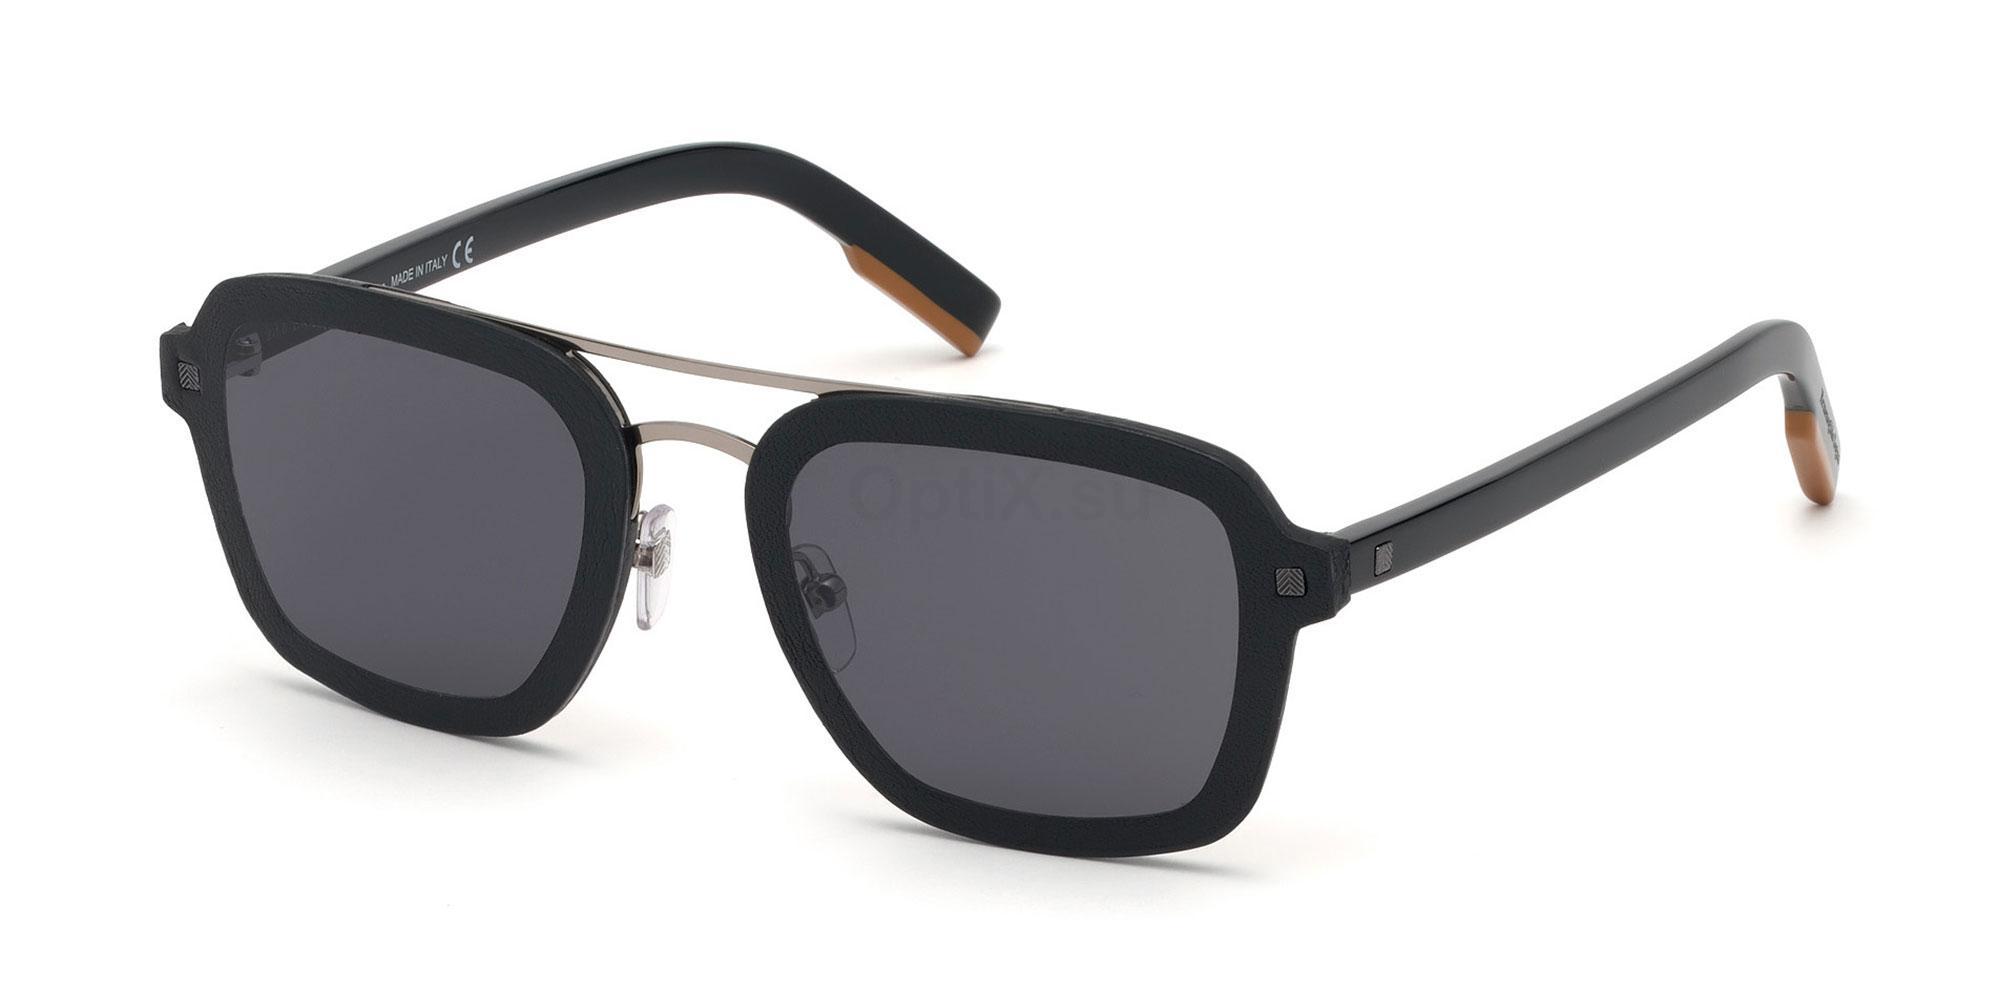 01A EZ0120 Sunglasses, Ermenegildo Zegna